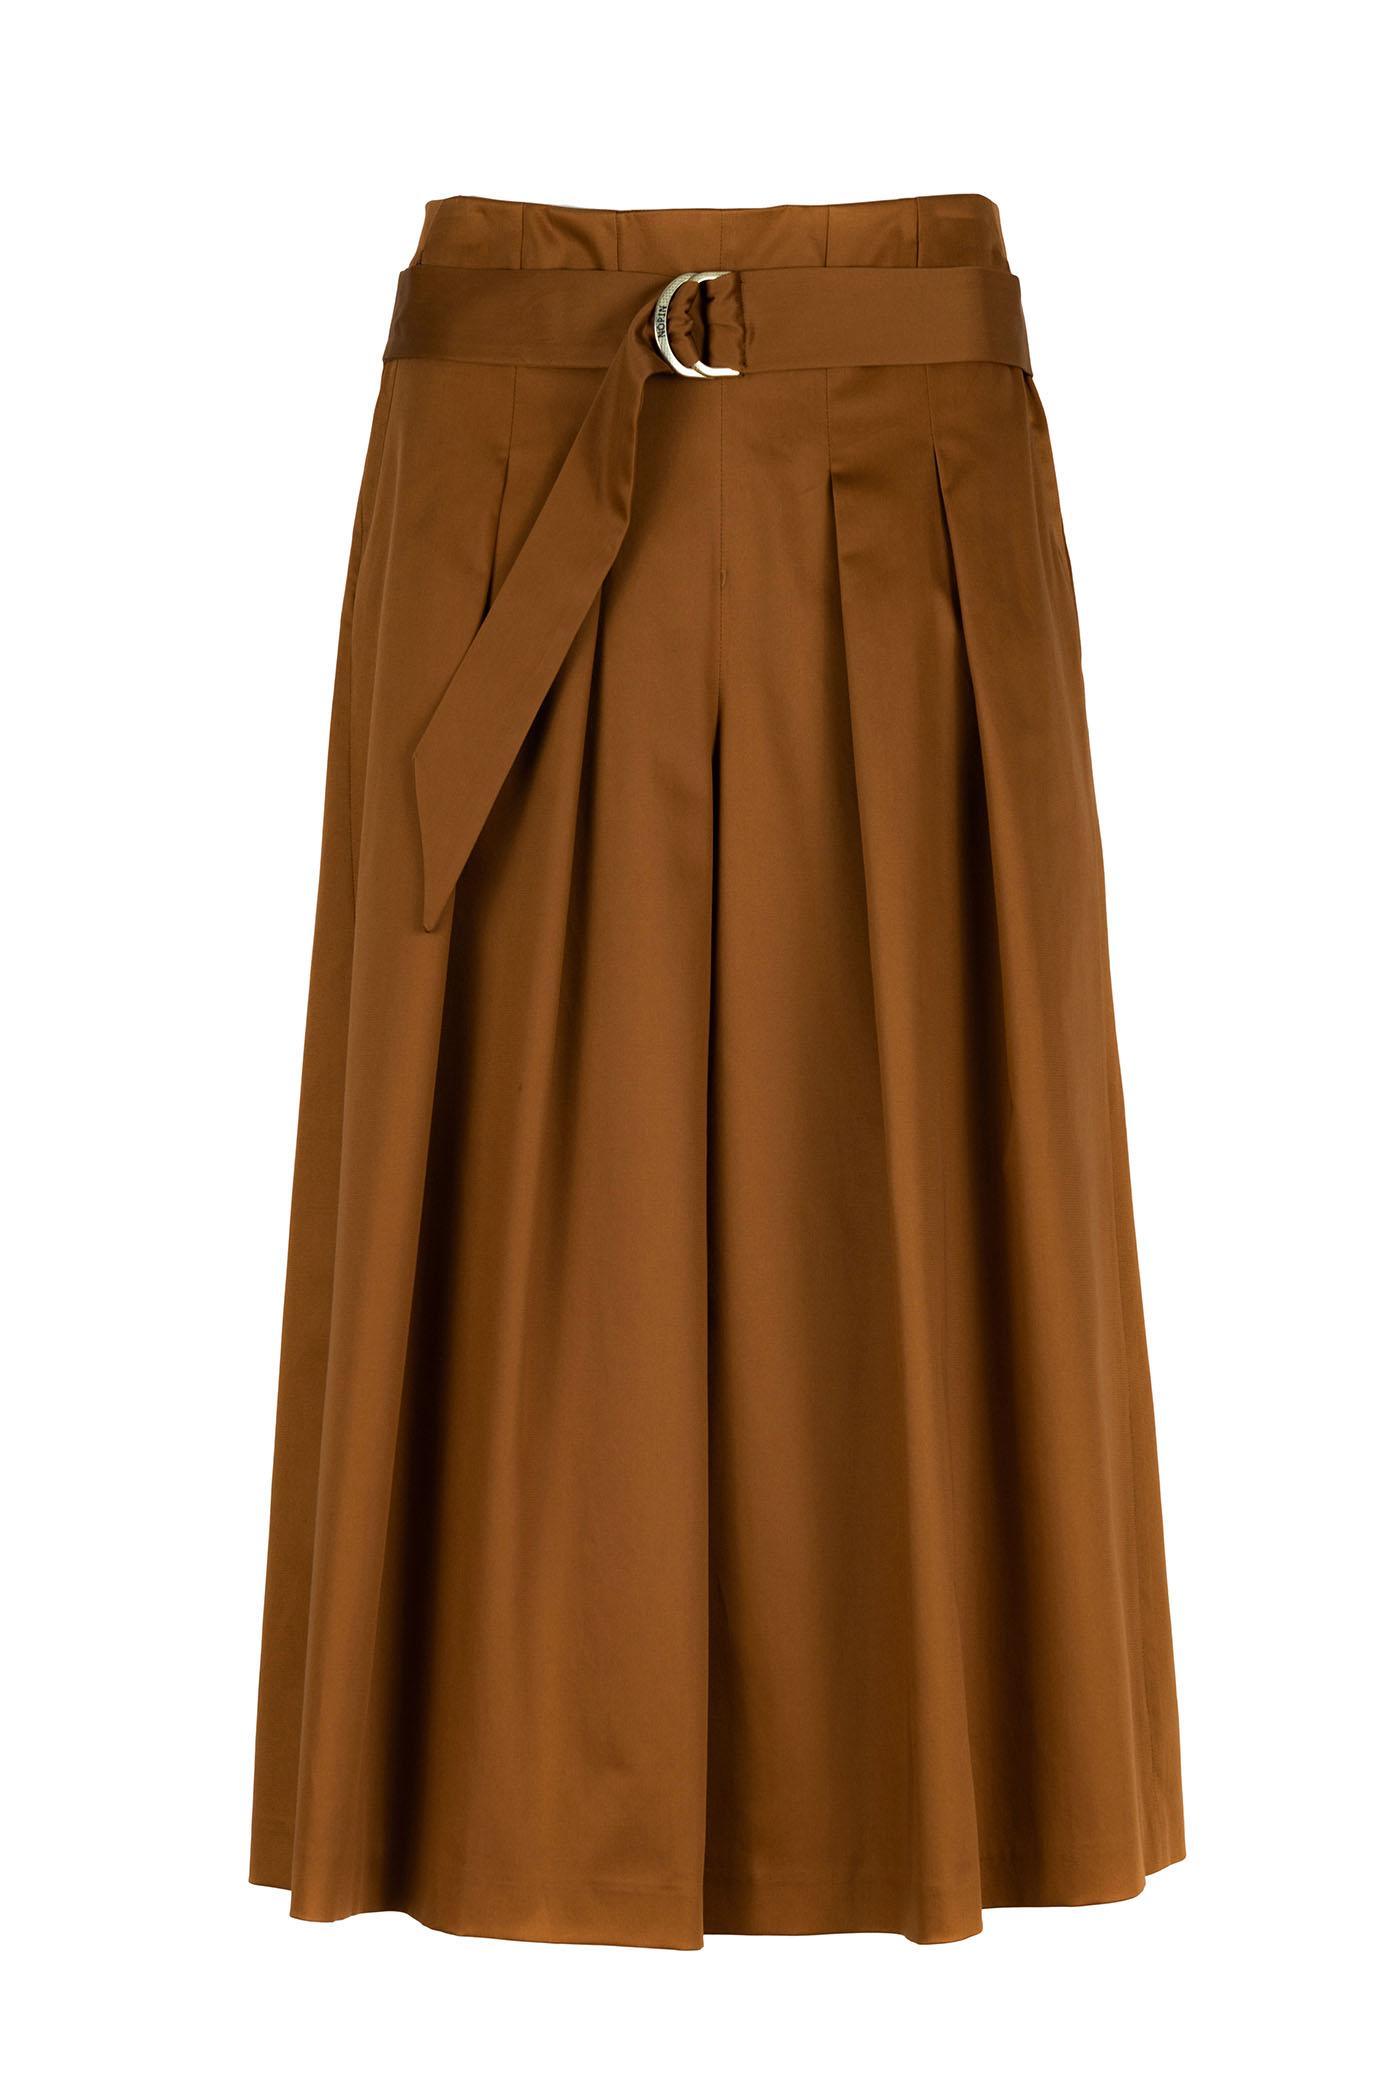 Caramel Skirt Nopin